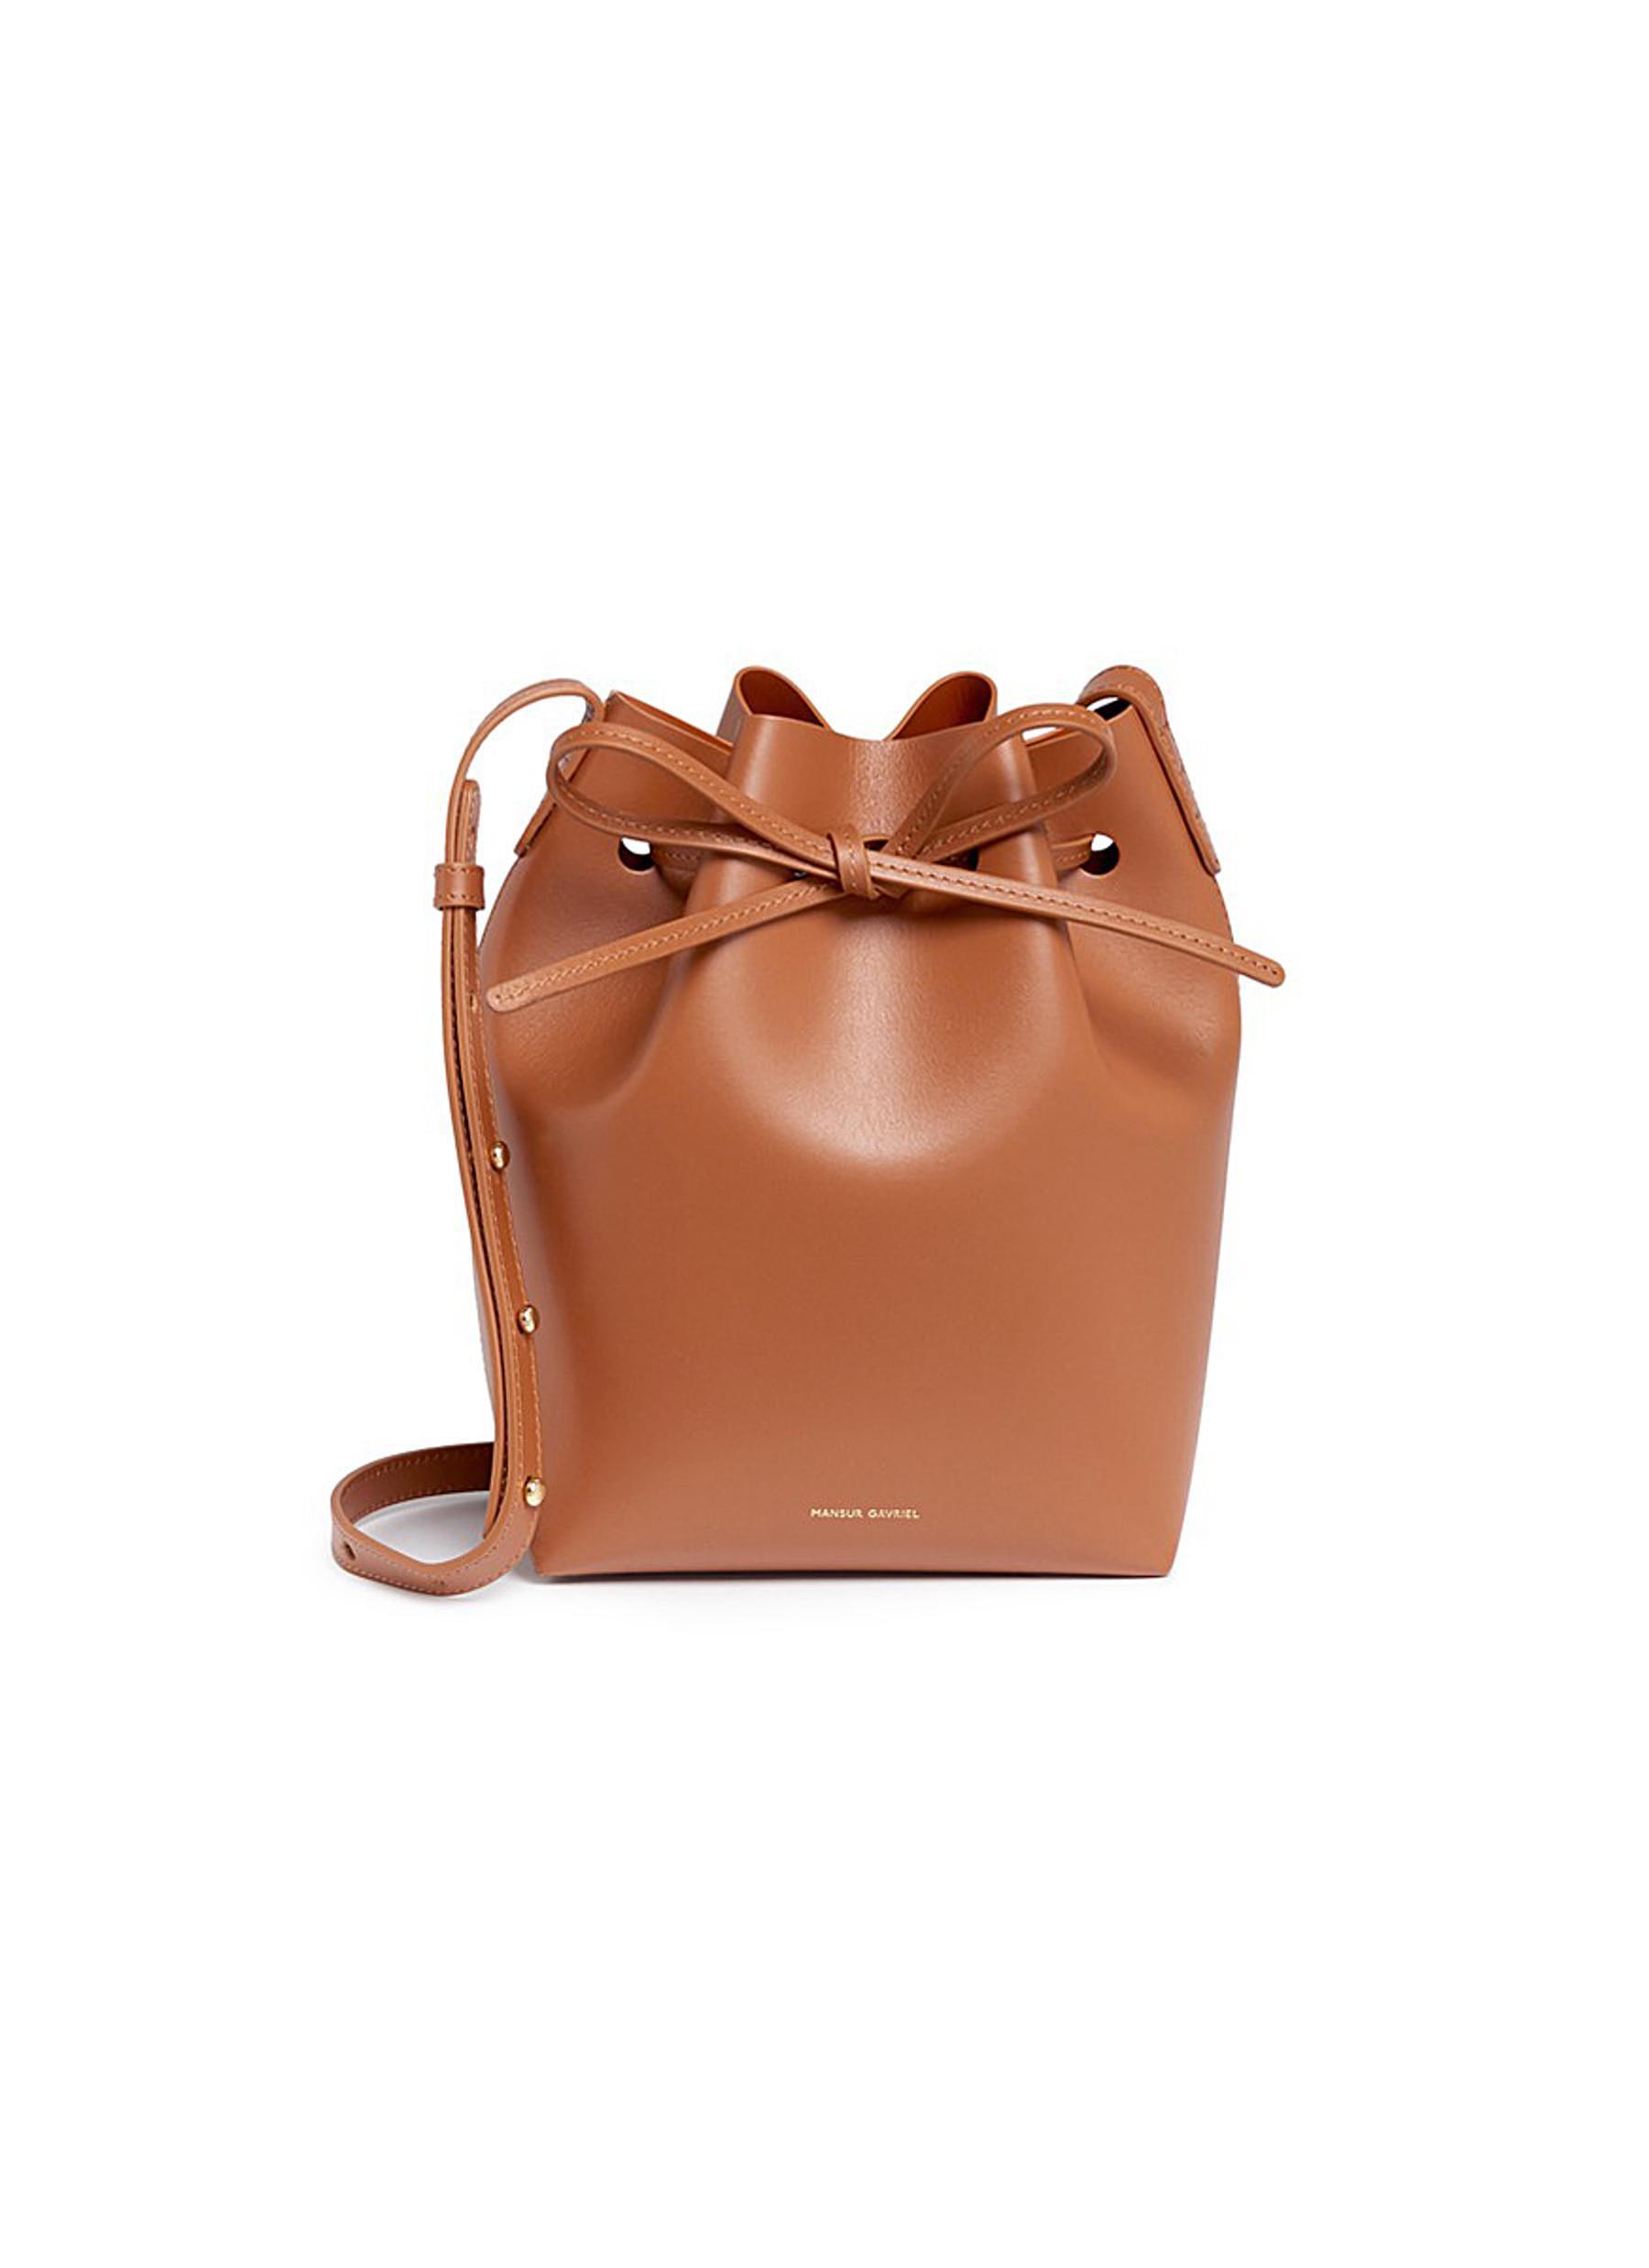 Mansur Gavriel Leathers 'Mini' leather bucket bag